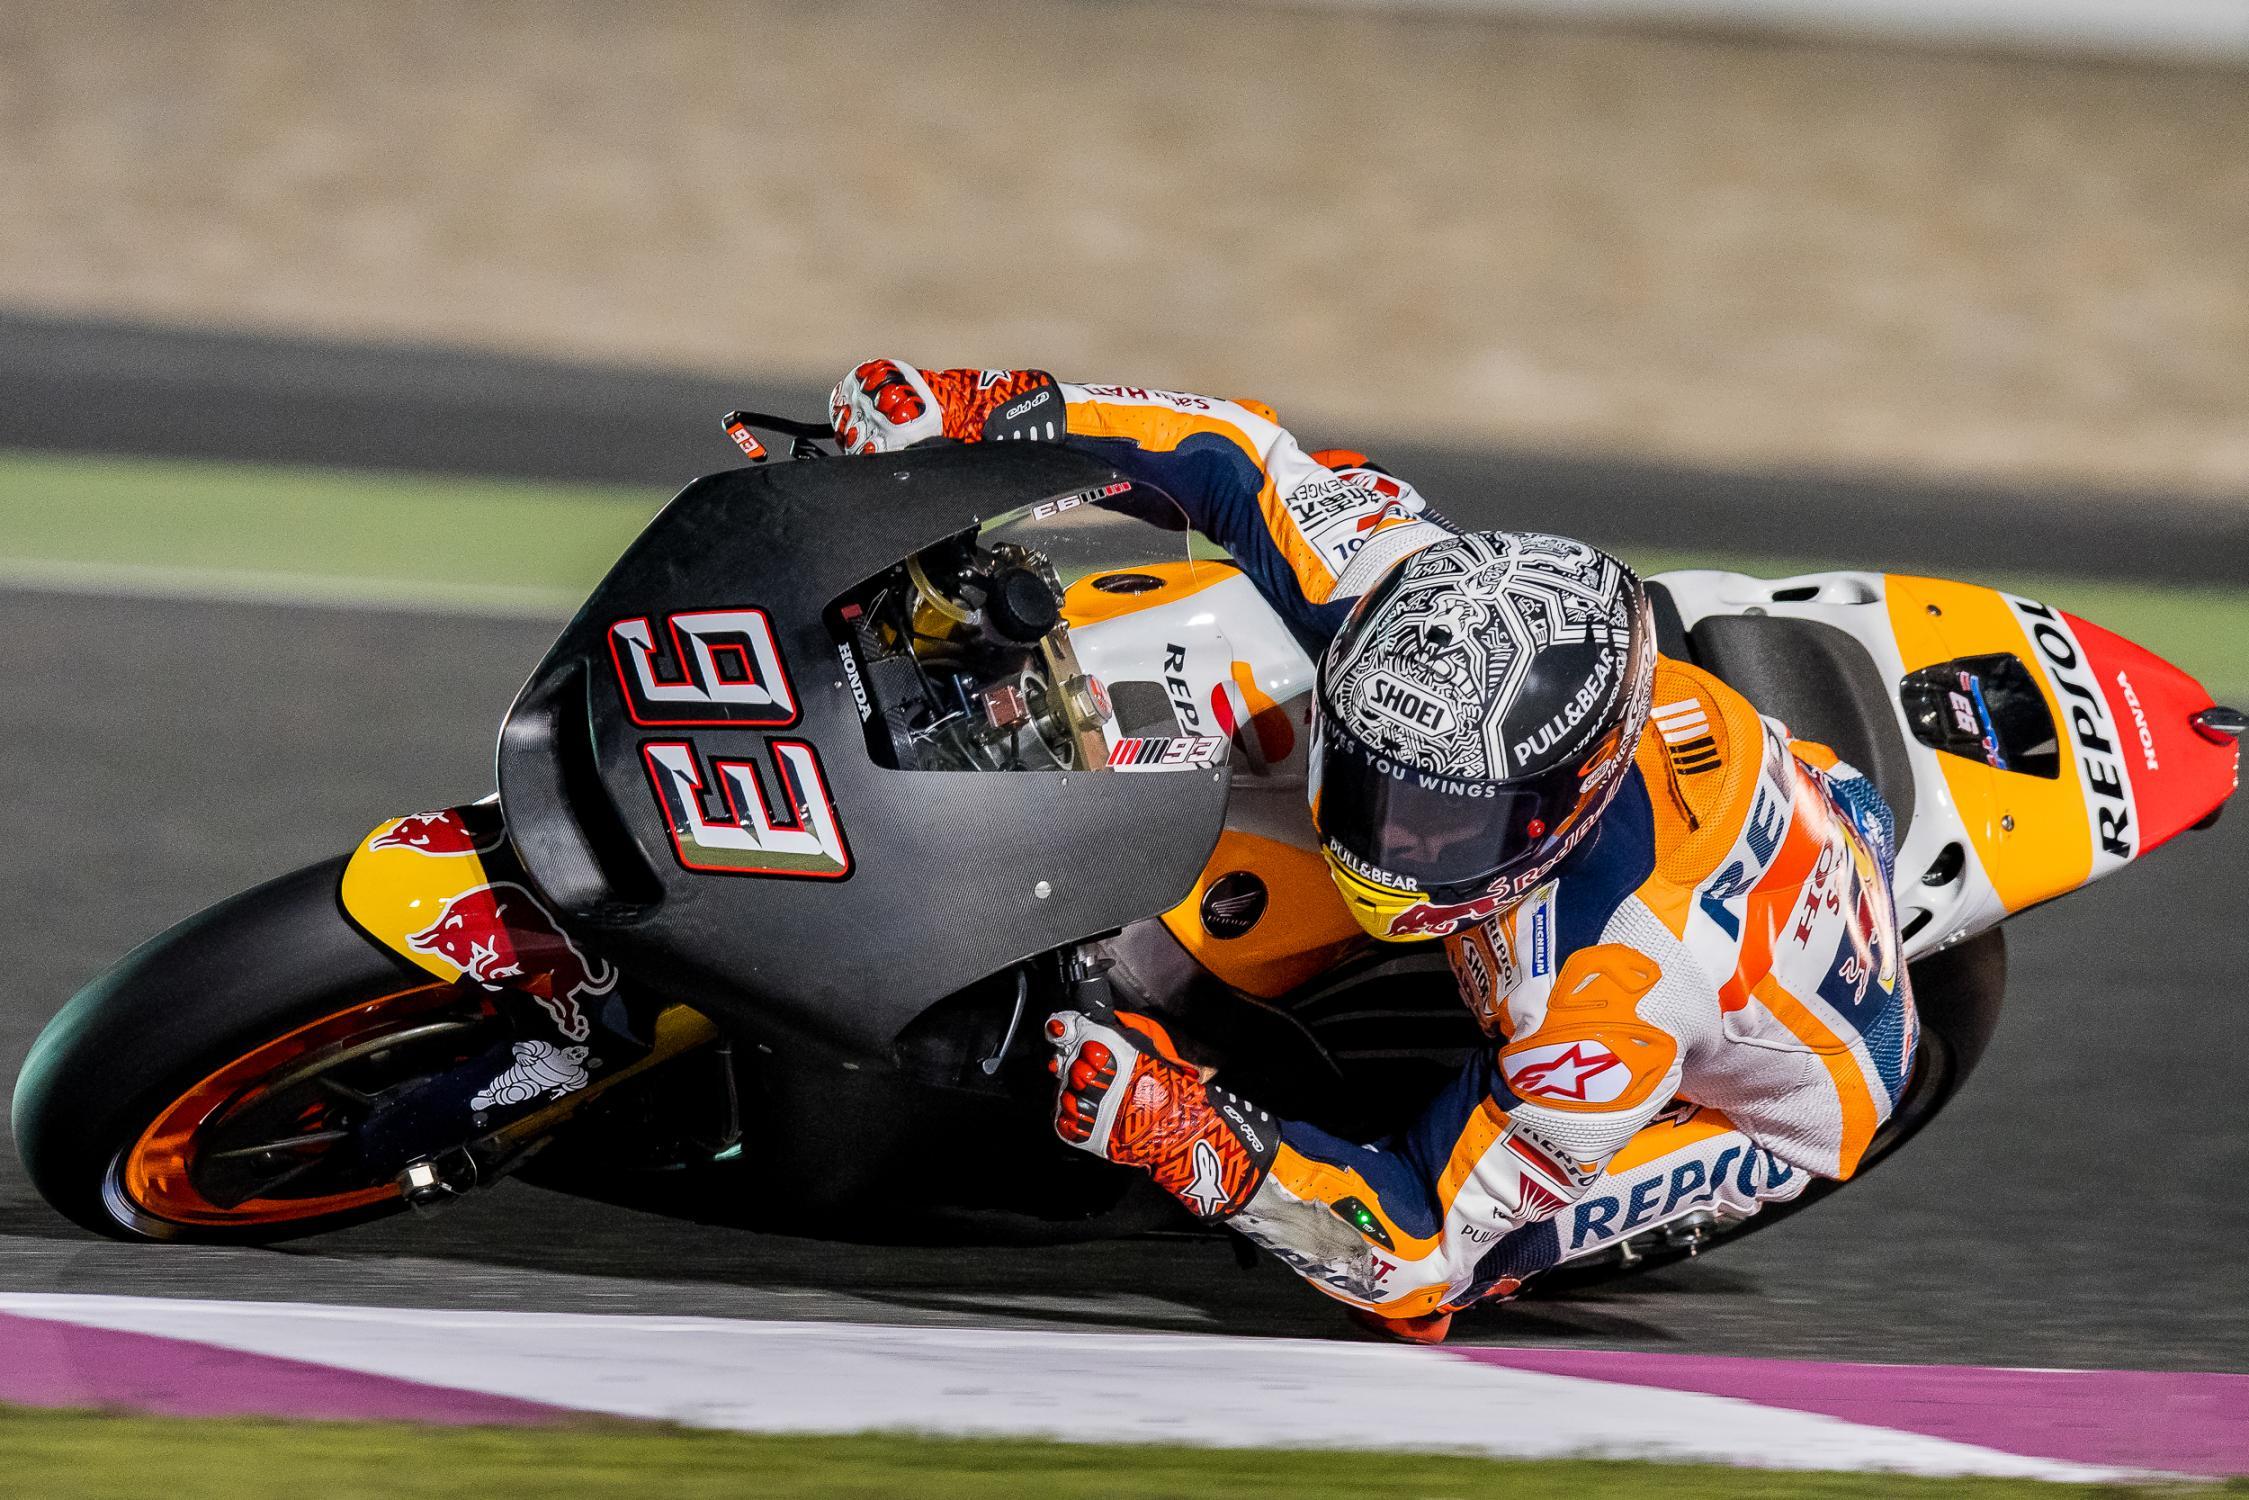 [MotoGP] Test Losail Dsc_6940.gallery_full_top_fullscreen